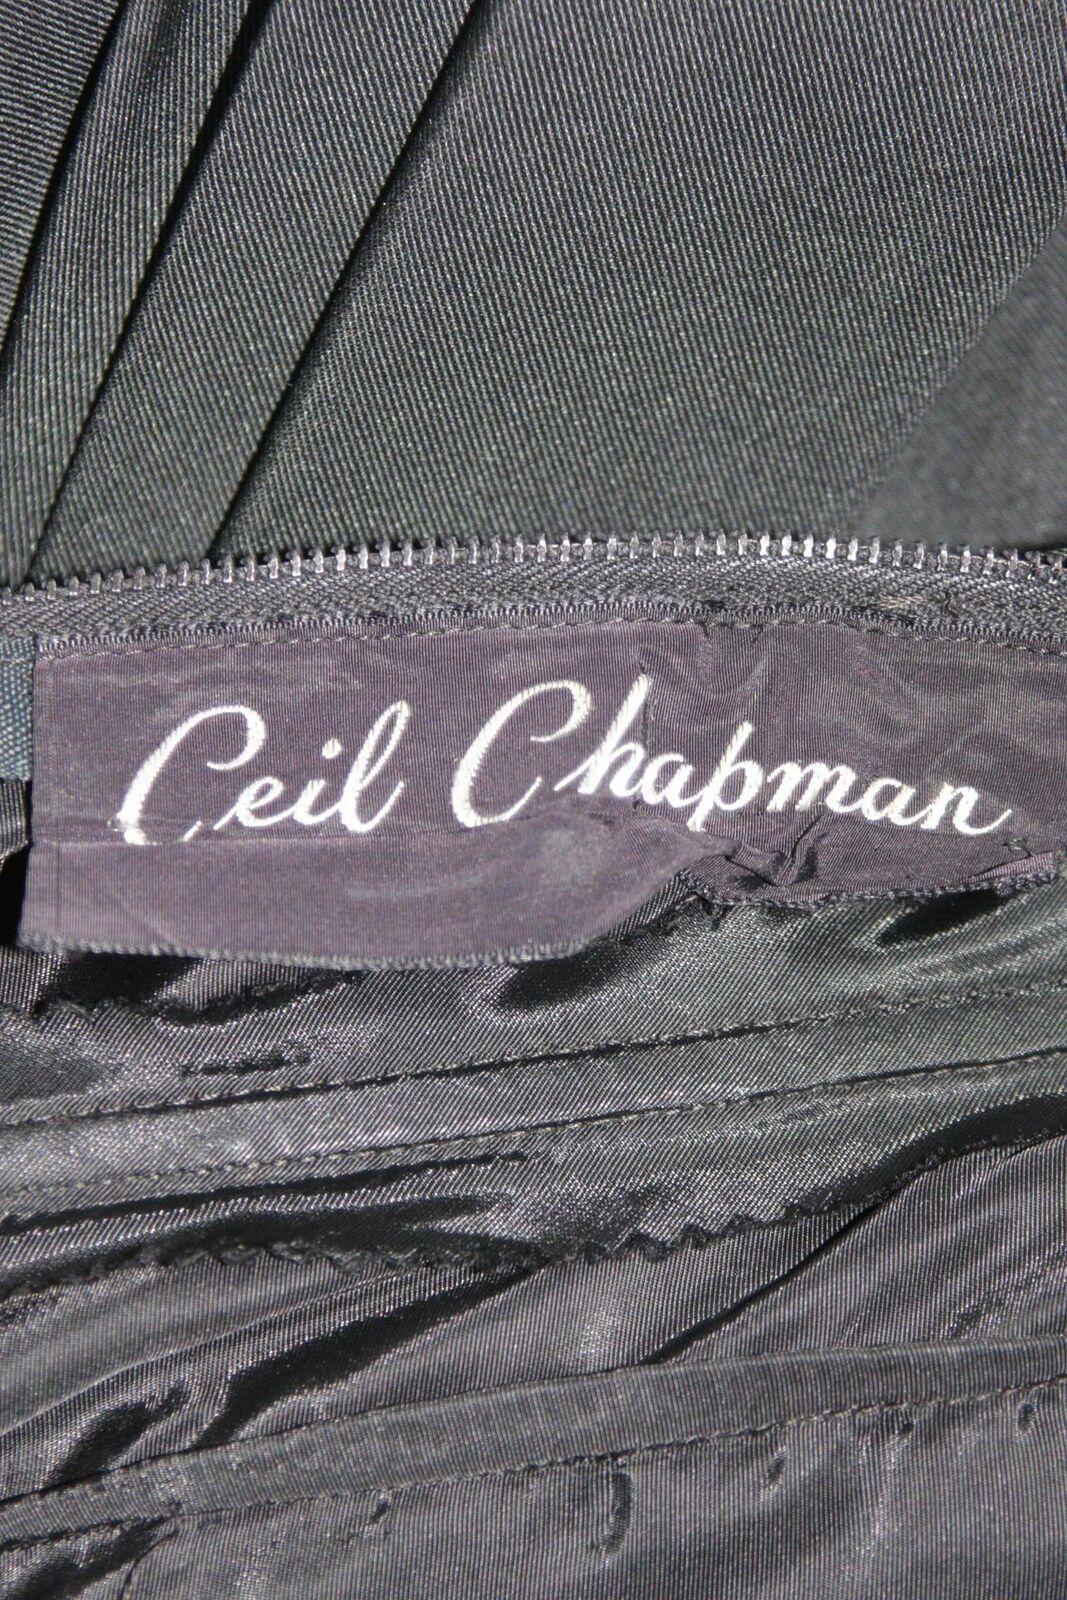 CEIL CHAPMAN 1950s Black Draped Cocktail Dress Si… - image 10